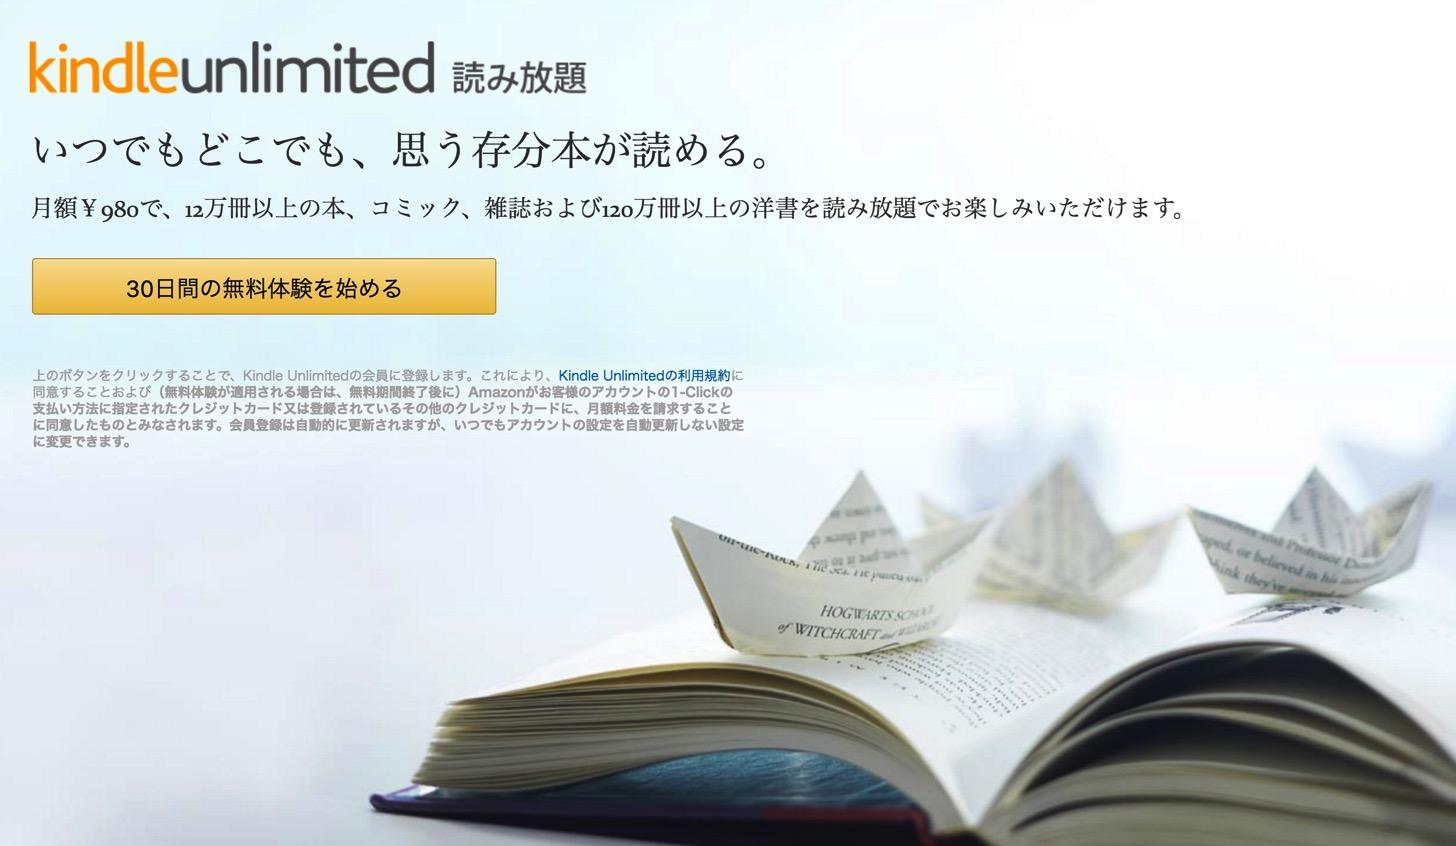 Kindle Unlimited(キンドル・アンリミテッド)